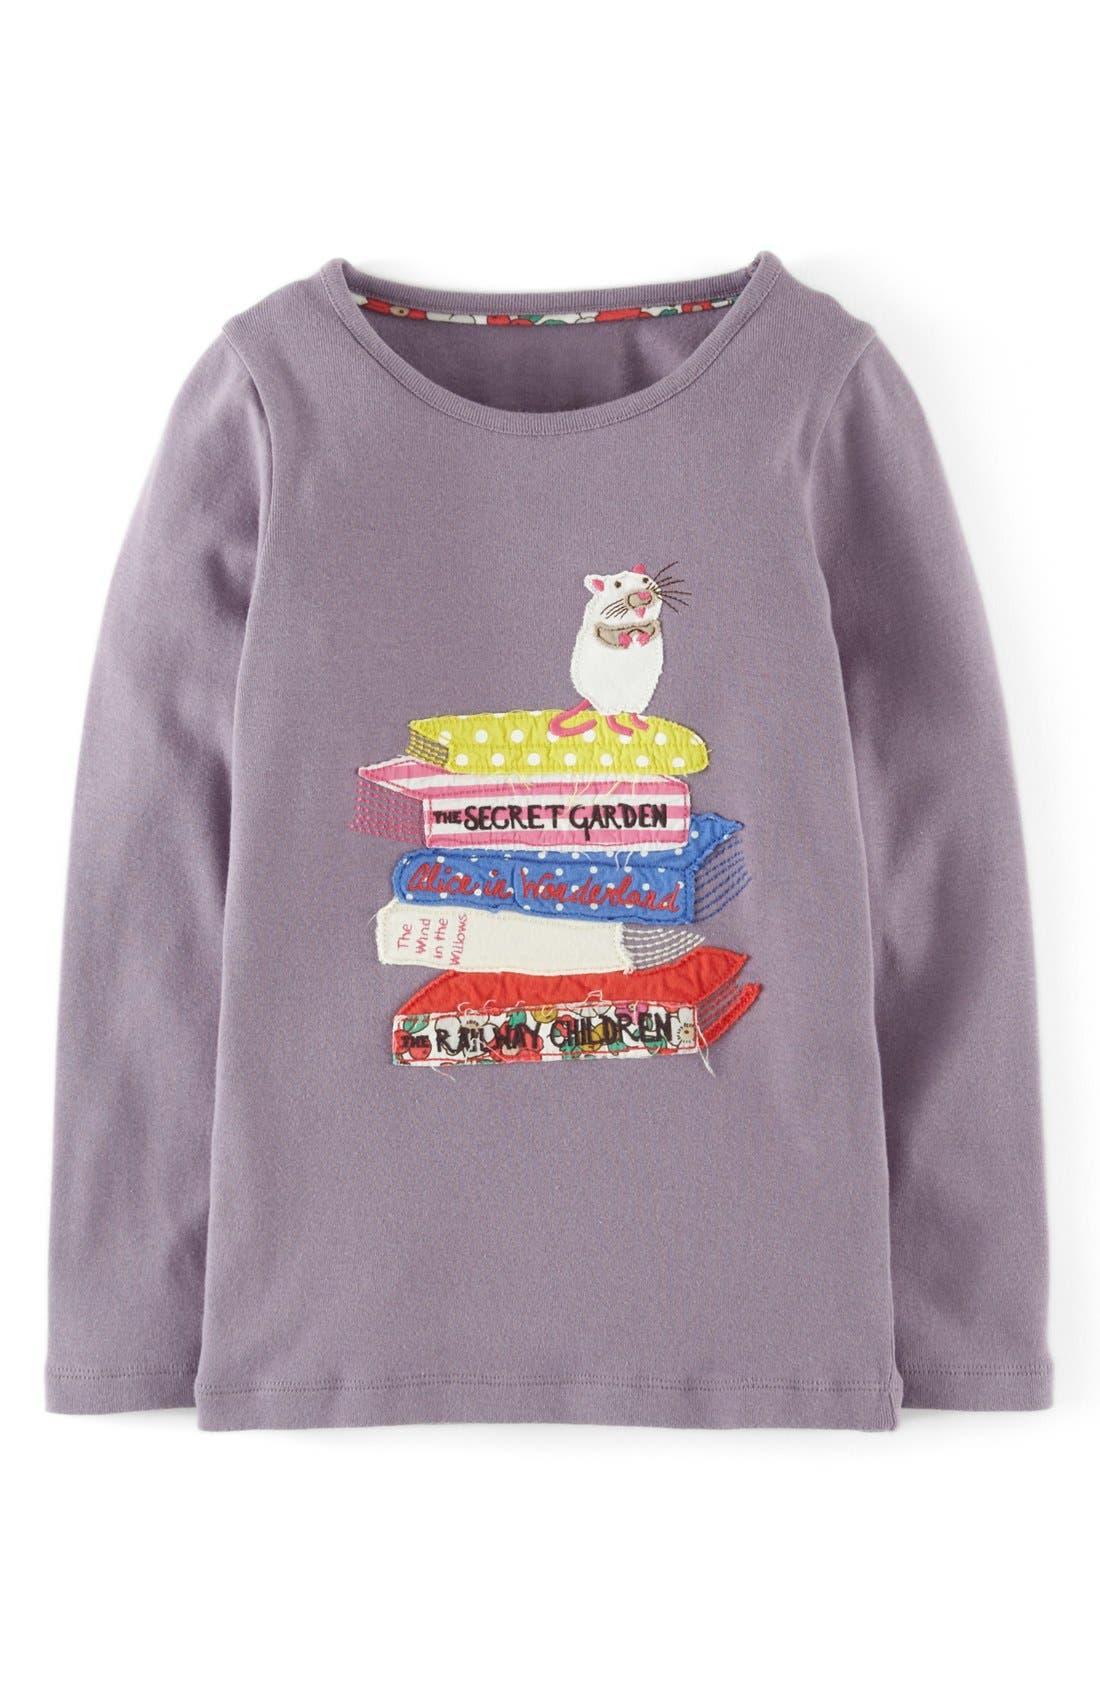 Alternate Image 1 Selected - Mini Boden Story Book Appliqué Long Sleeve Tee (Toddler Girls, Little Girls & Big Girls)